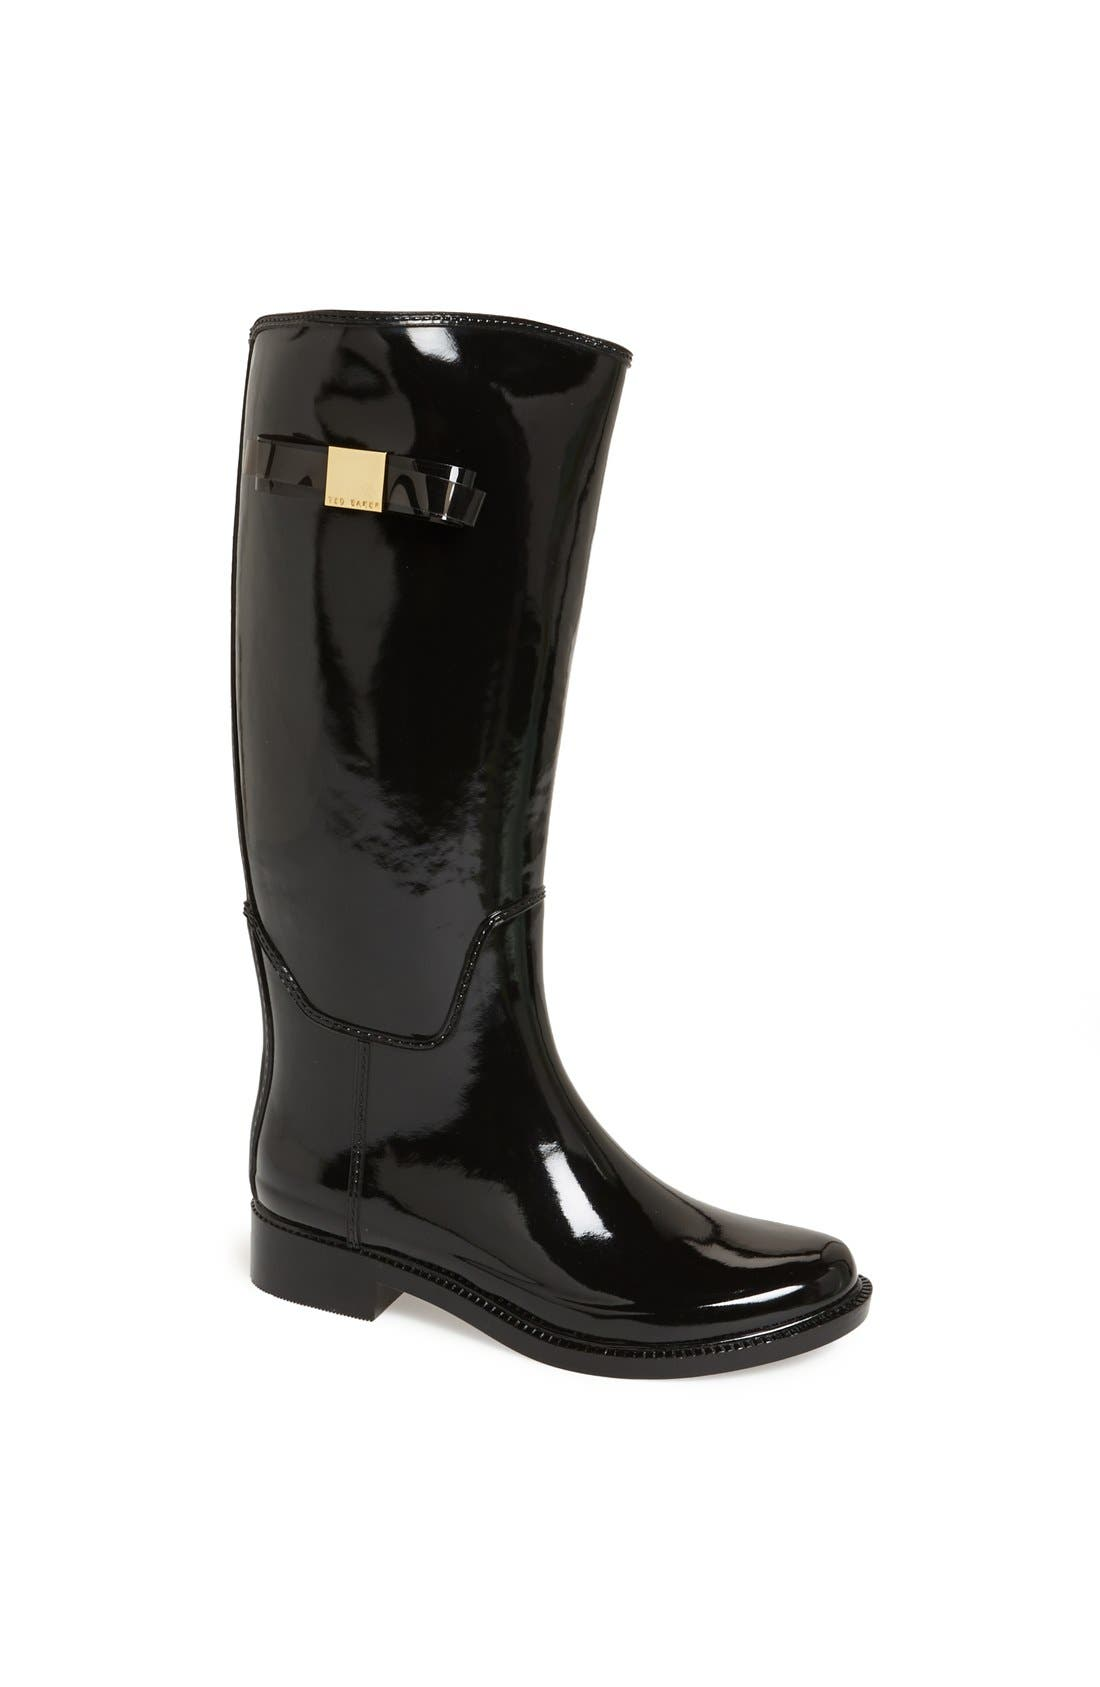 Alternate Image 1 Selected - Ted Baker London 'Scara' Rain Boot (Women)